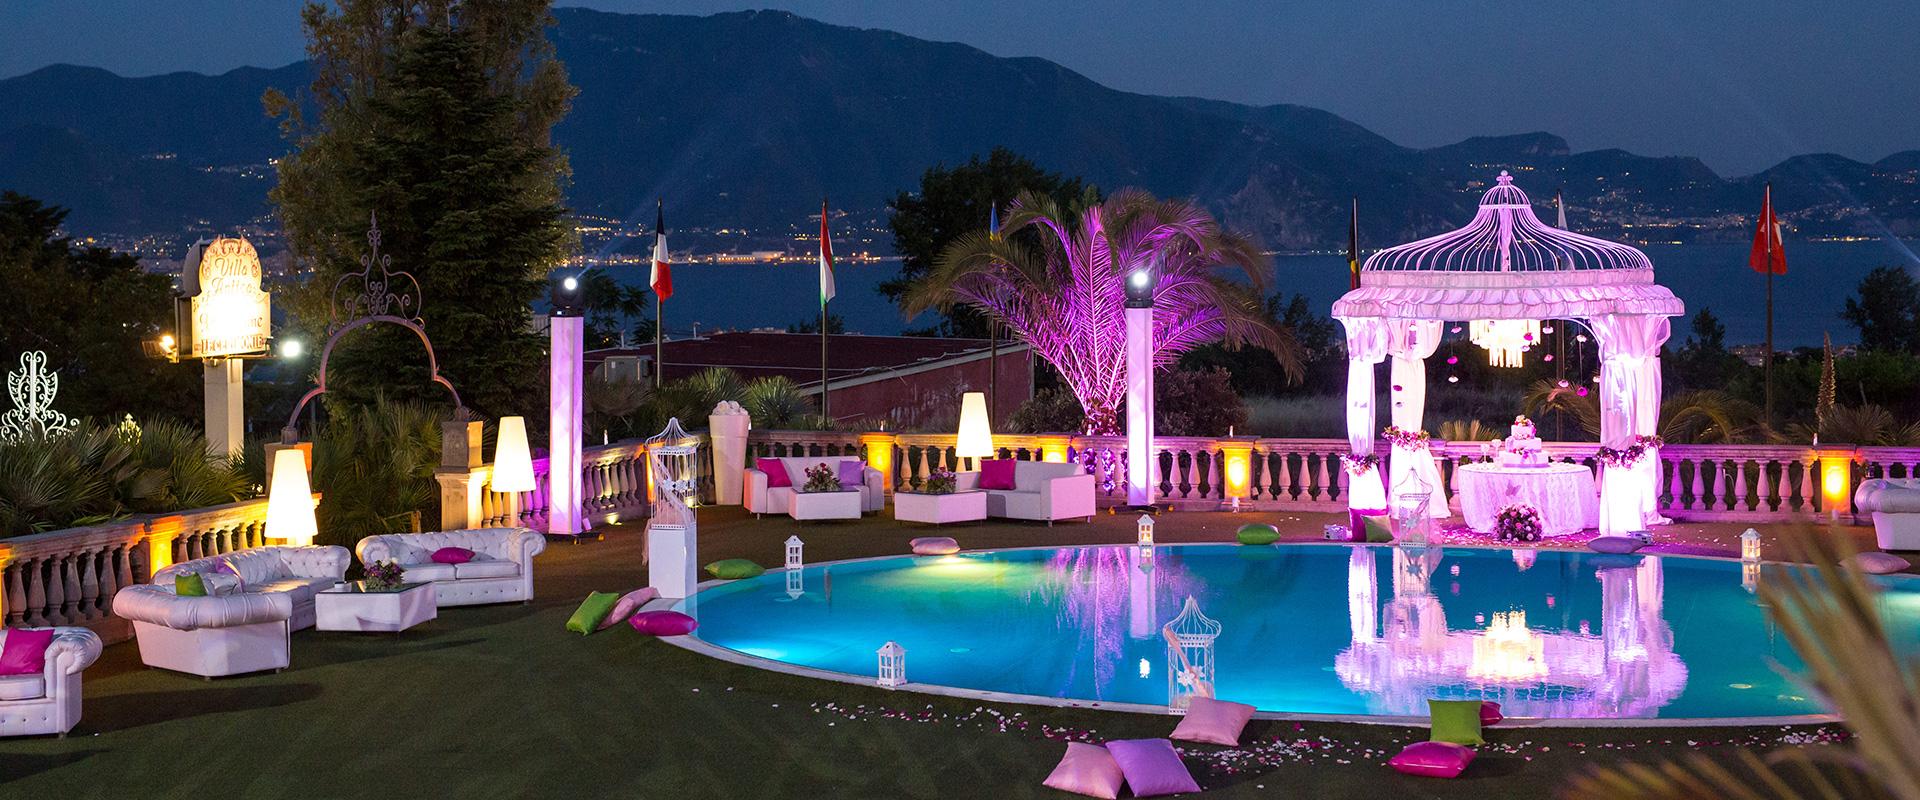 Foto interni Villa per matrimoni Napoli